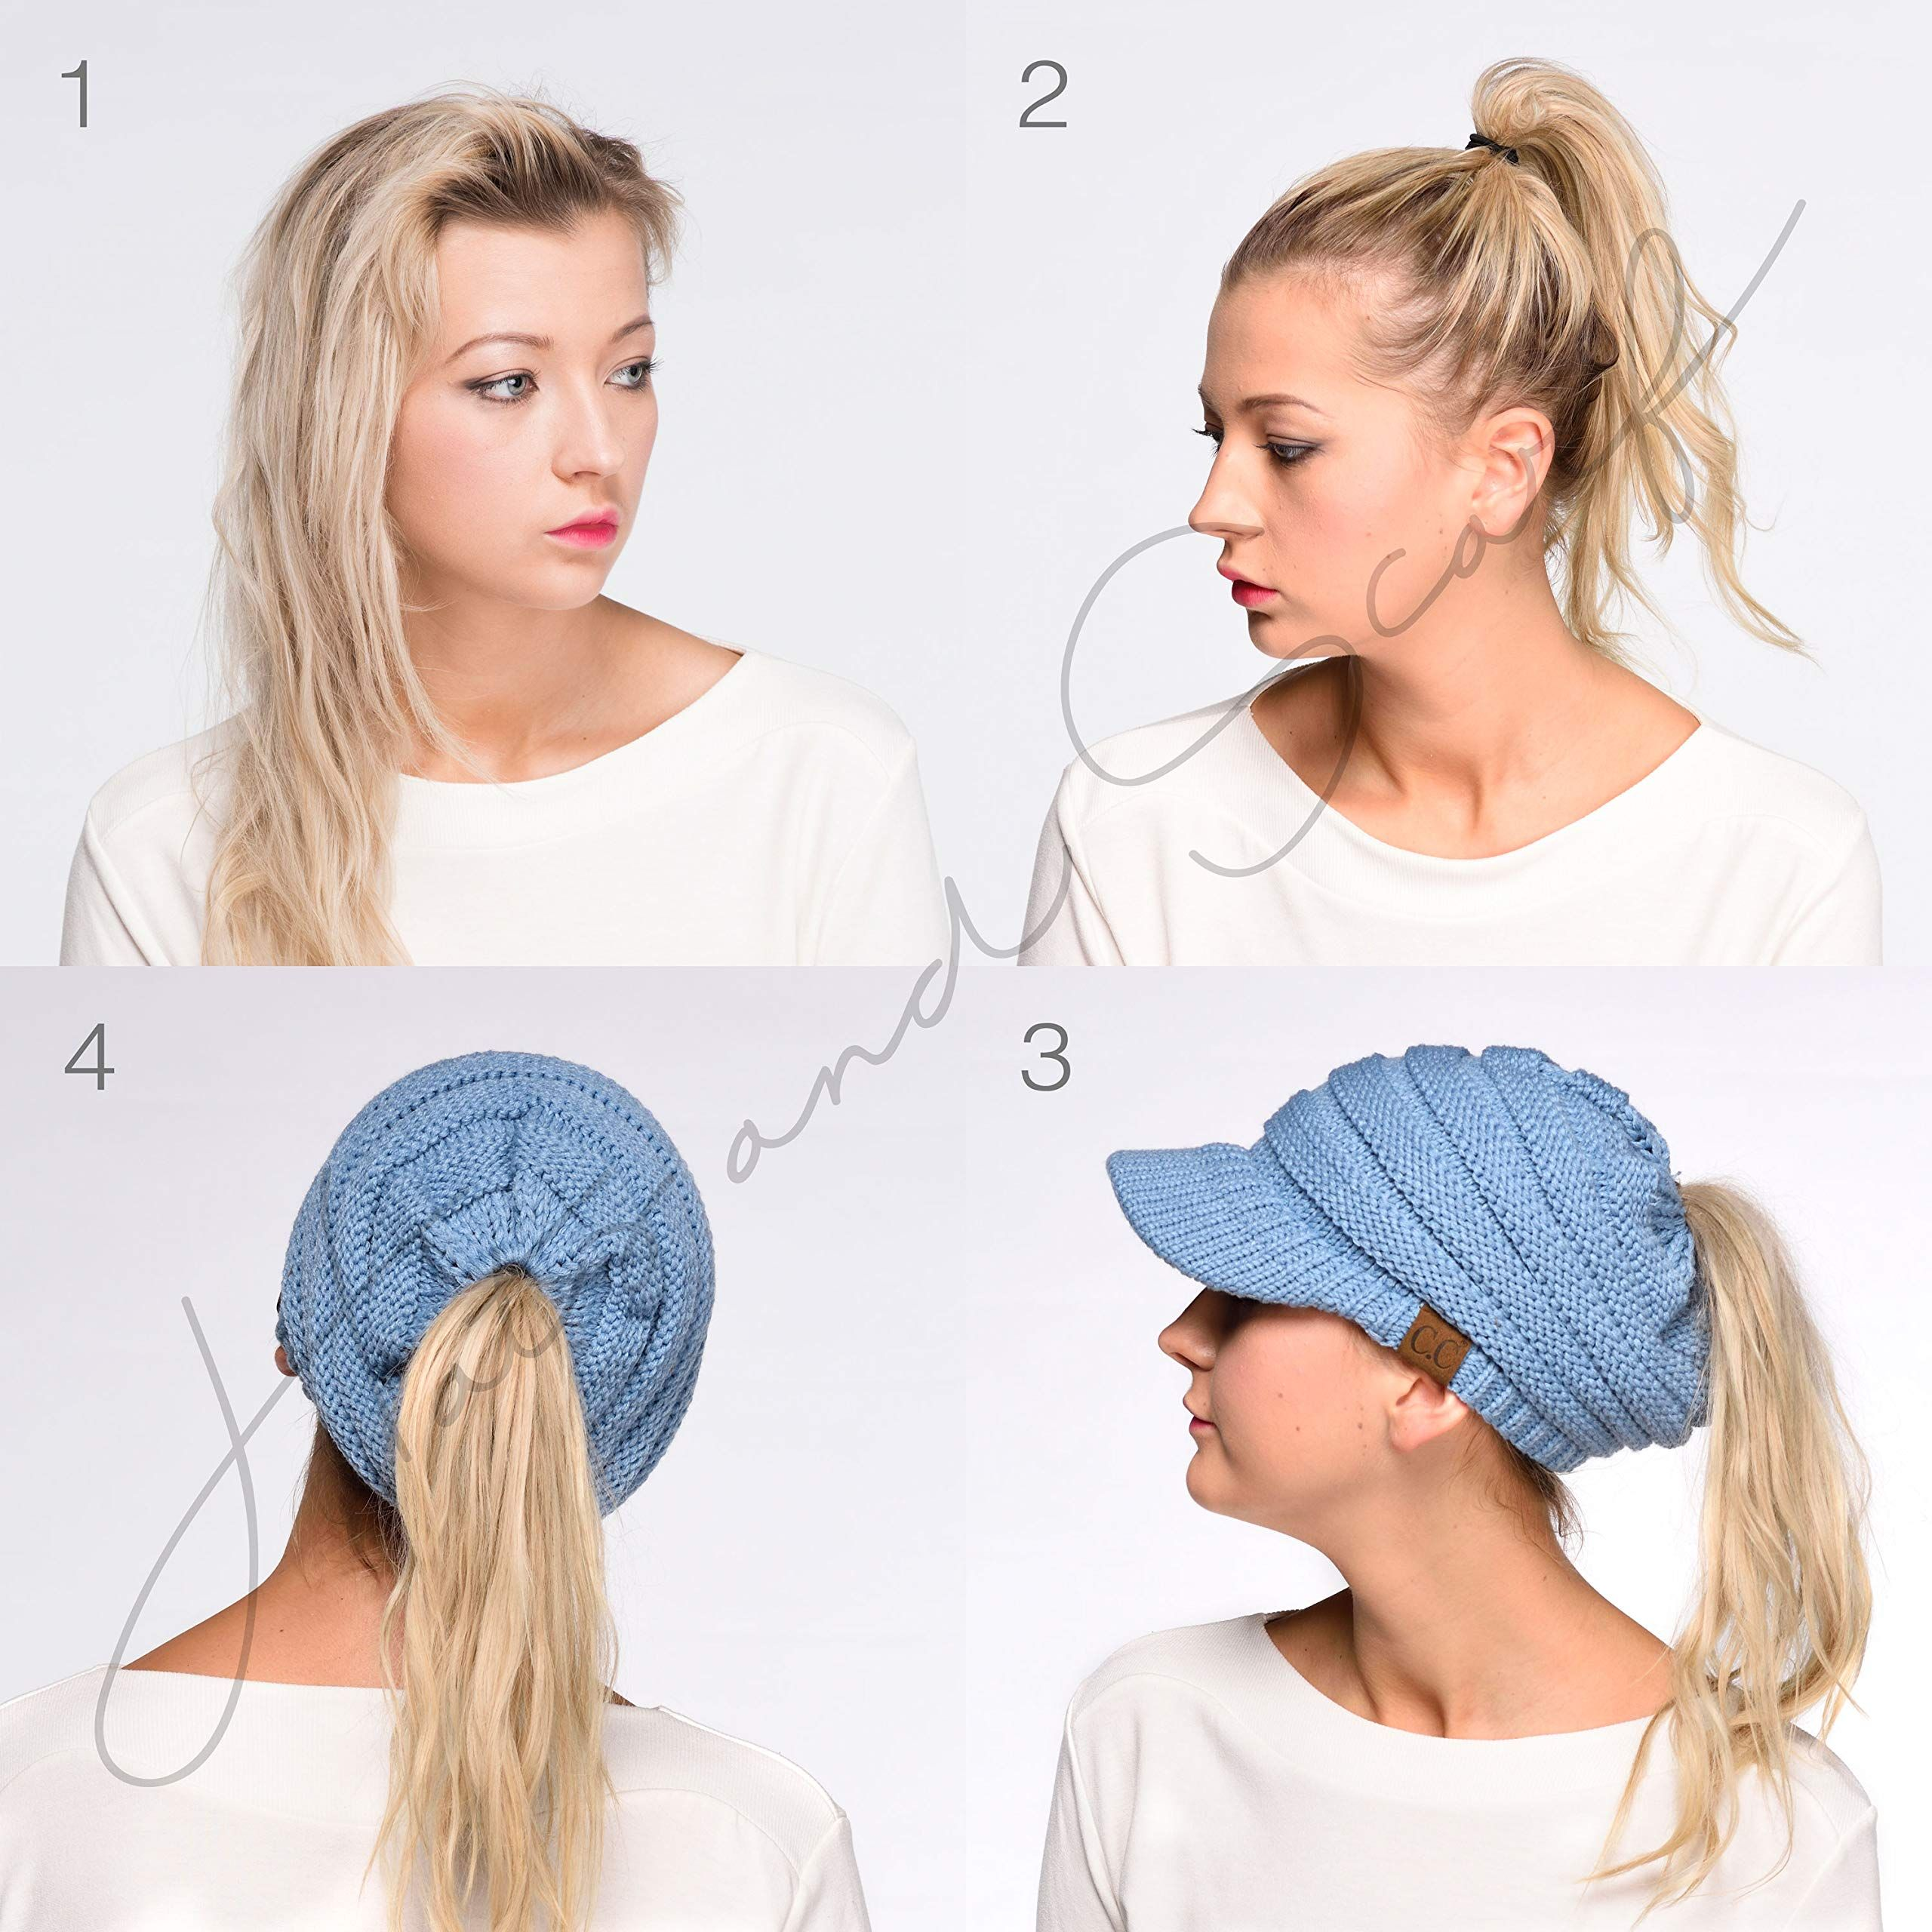 c3b859acdbb172 Hatsandscarf C.C Exclusives Messy Bun Ponytail Visor Brim Beanie Hat  (MB-131) (New Olive) - Cool Beanie Hats